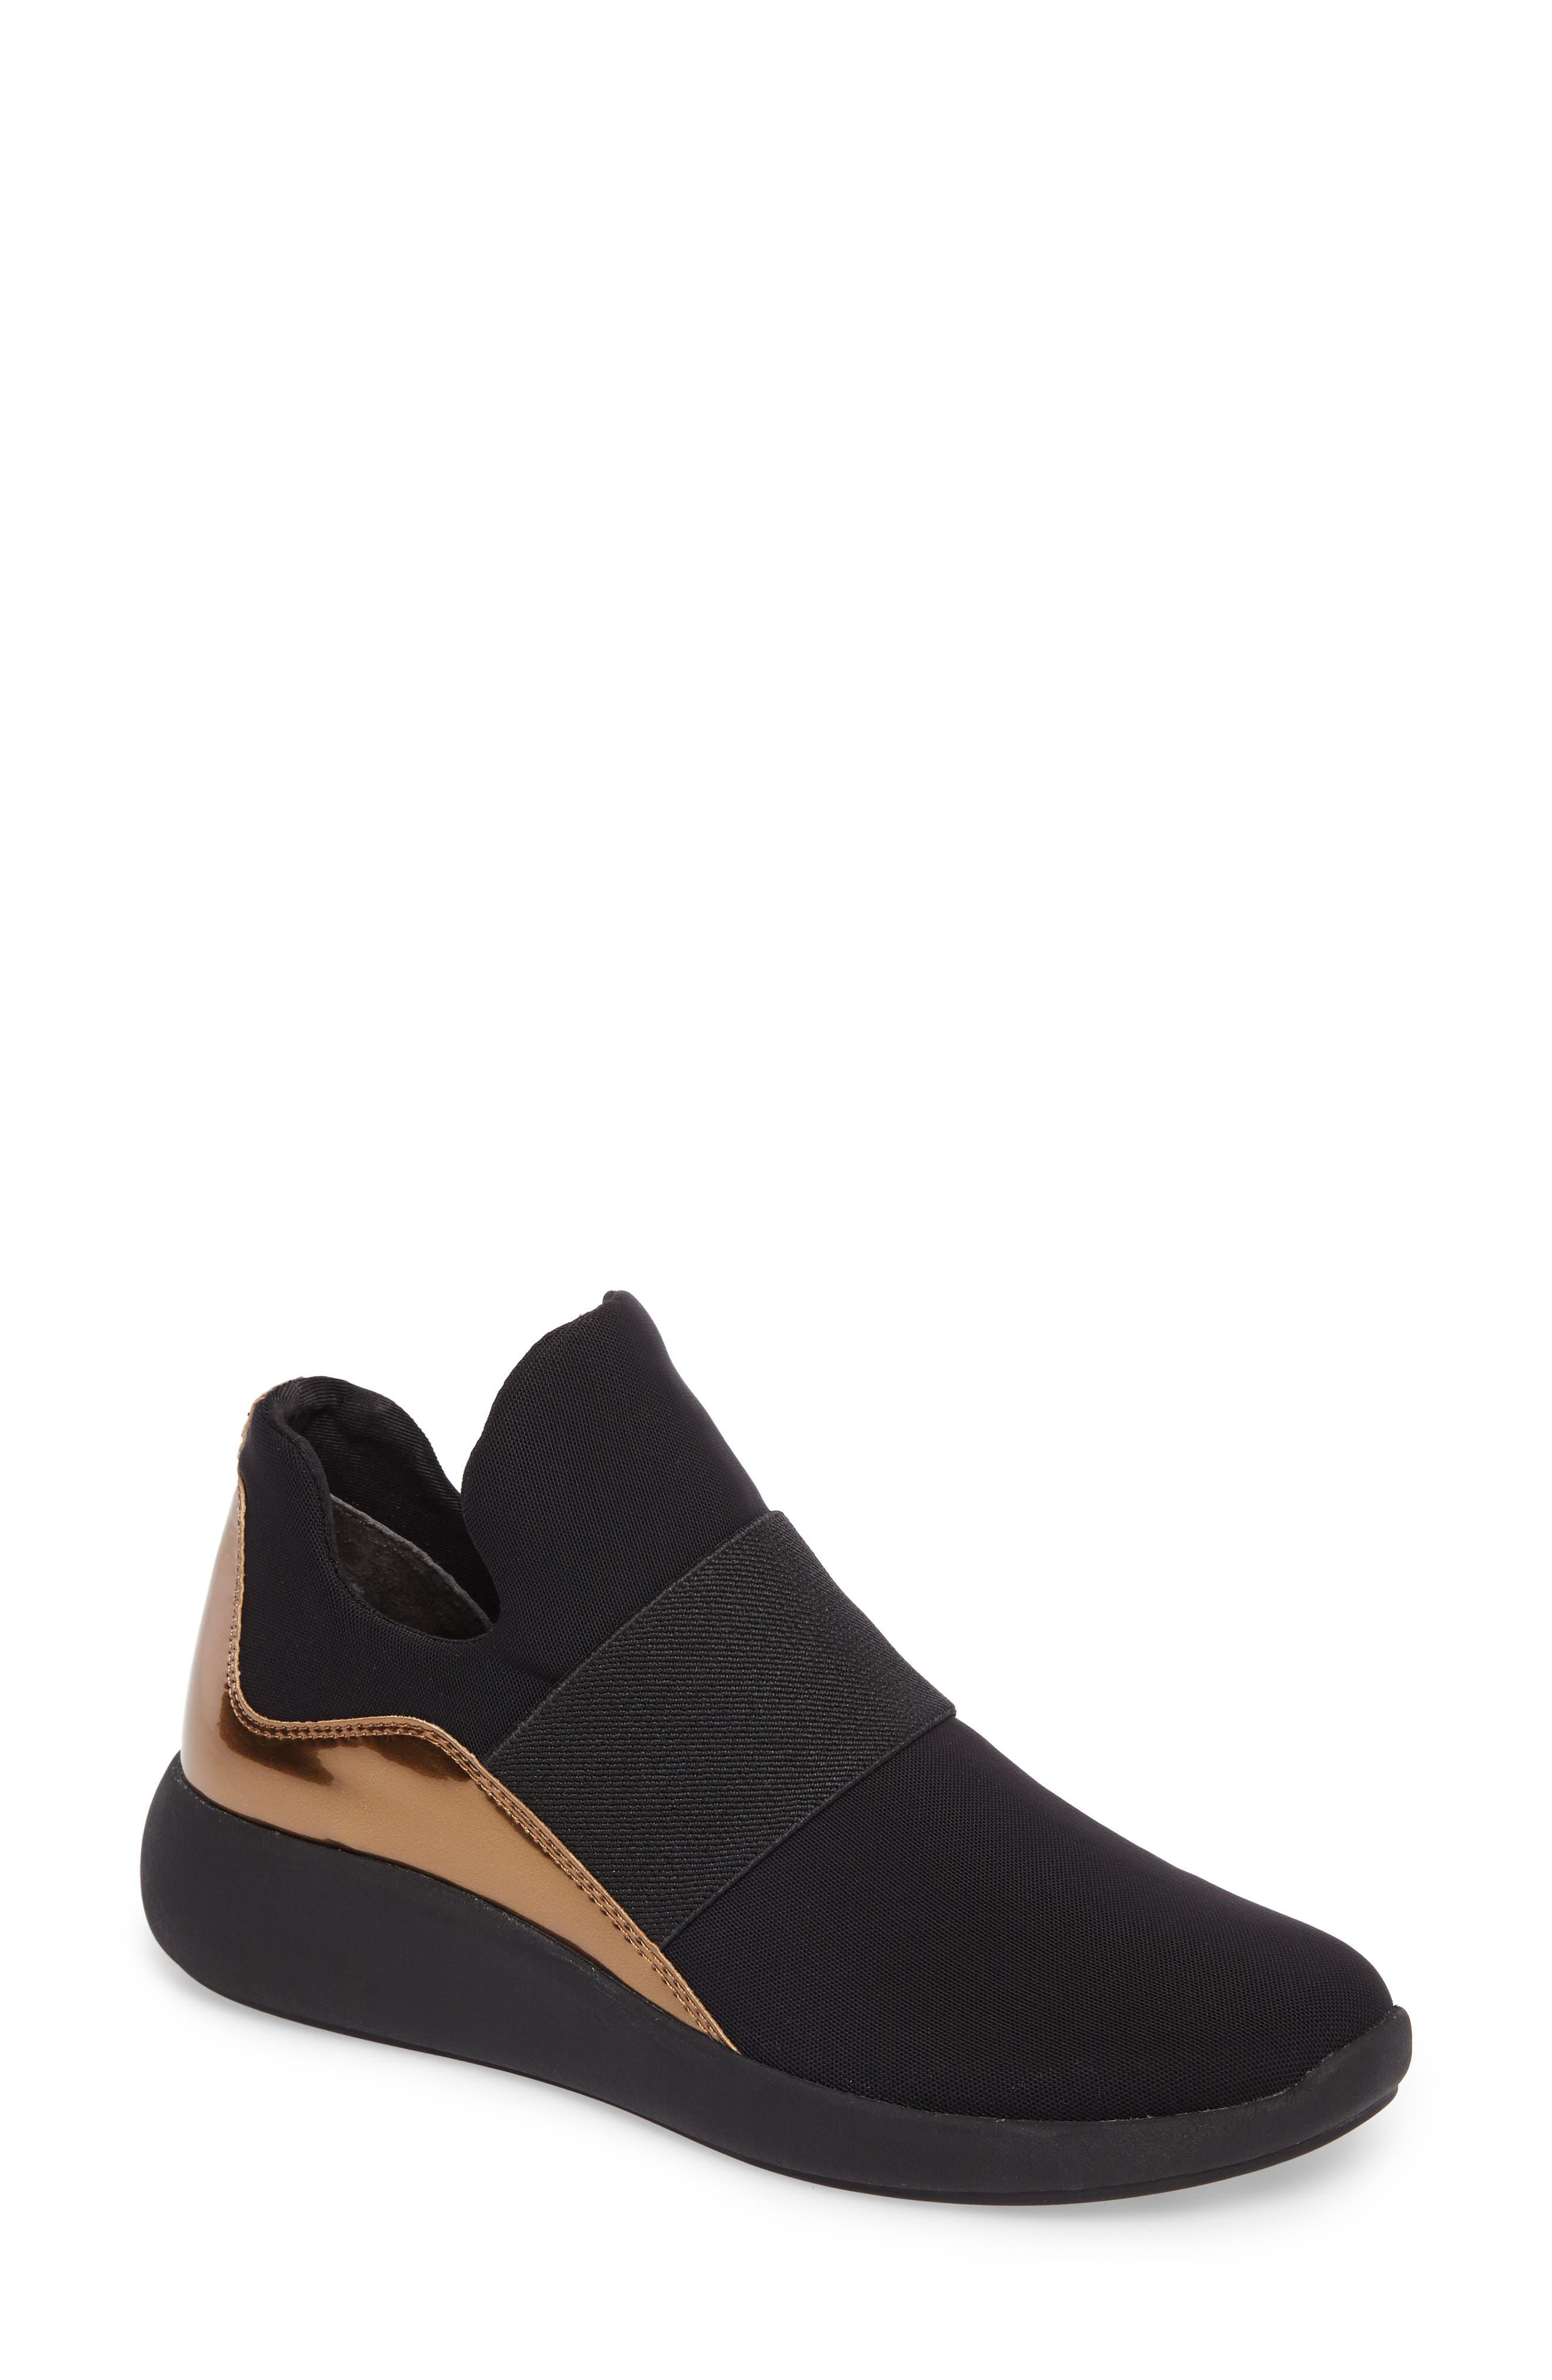 Alternate Image 1 Selected - Donna Karan Cory Slip-On Sneaker (Women)